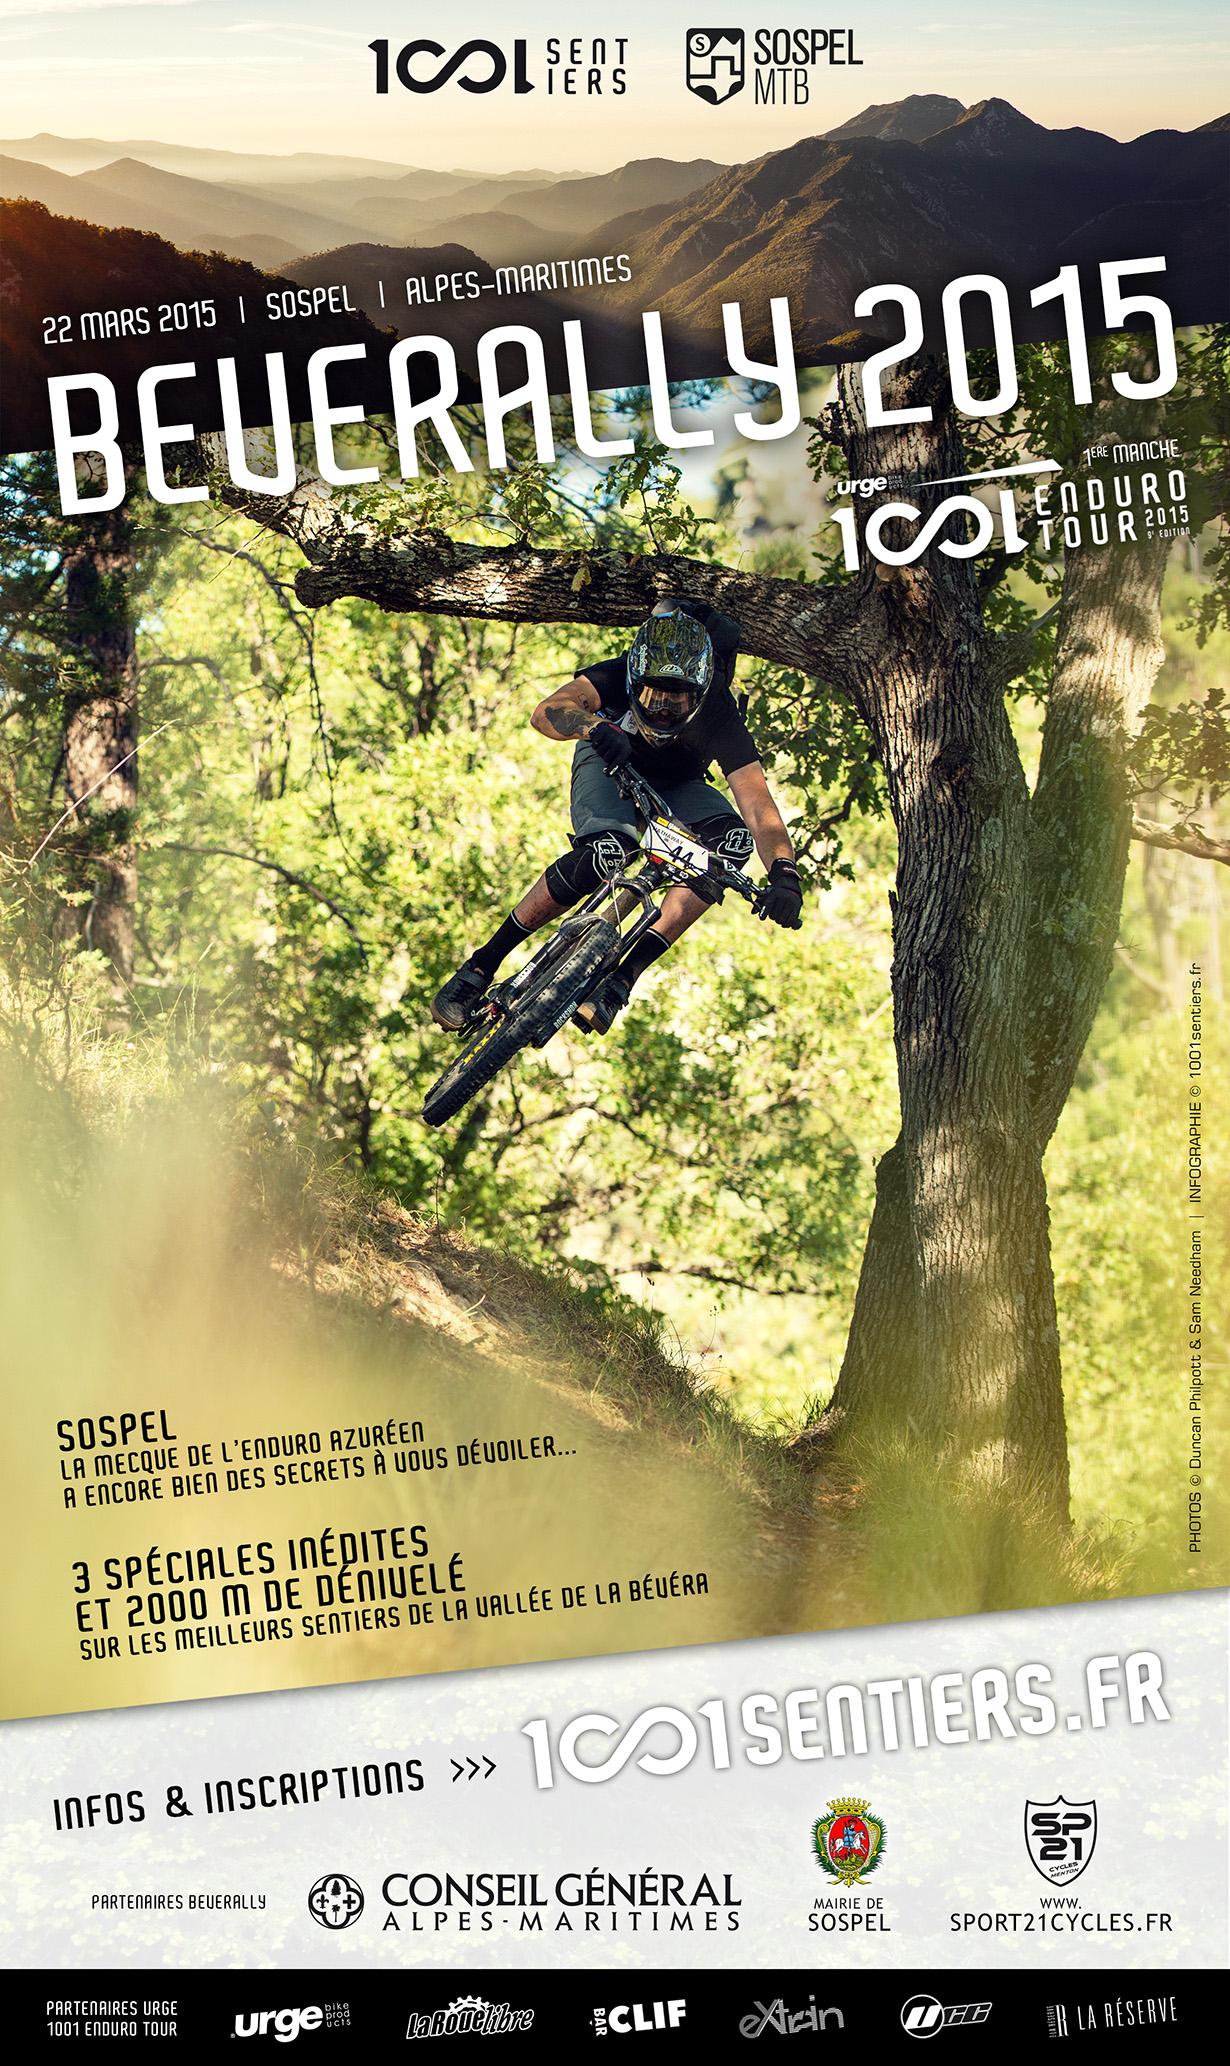 Affiche Beverally 2015 urge 1001 enduro tour